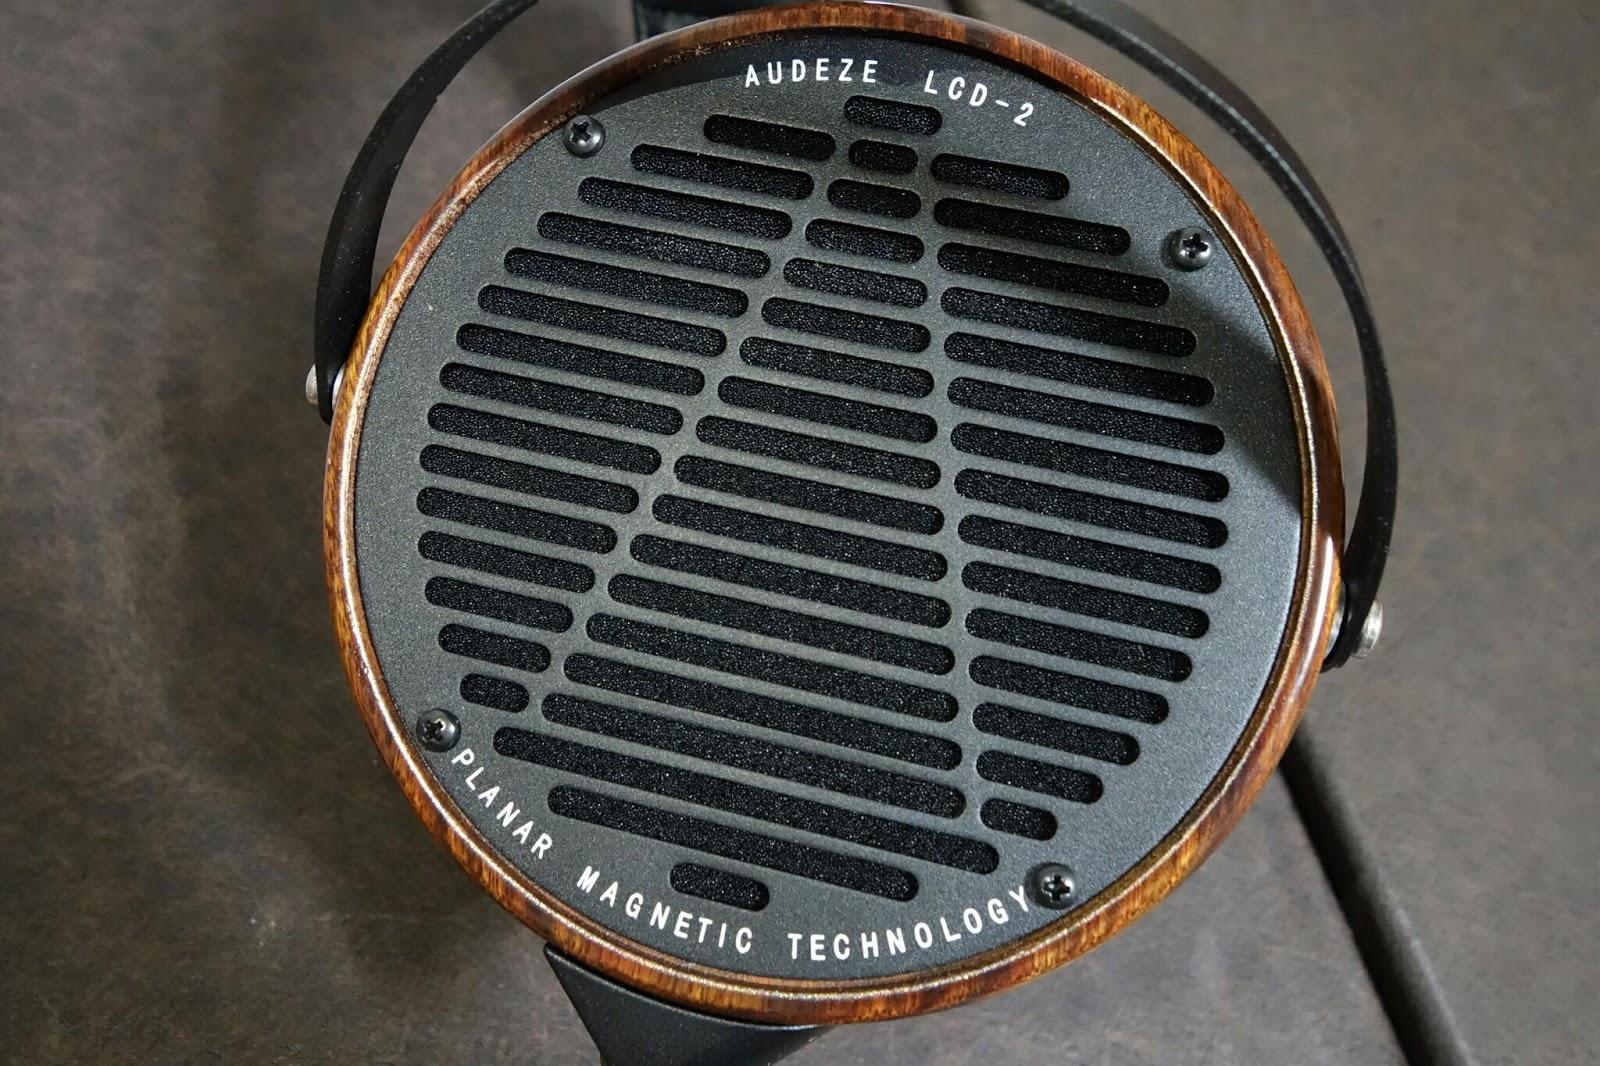 audeze lcd-2 fazor serial number